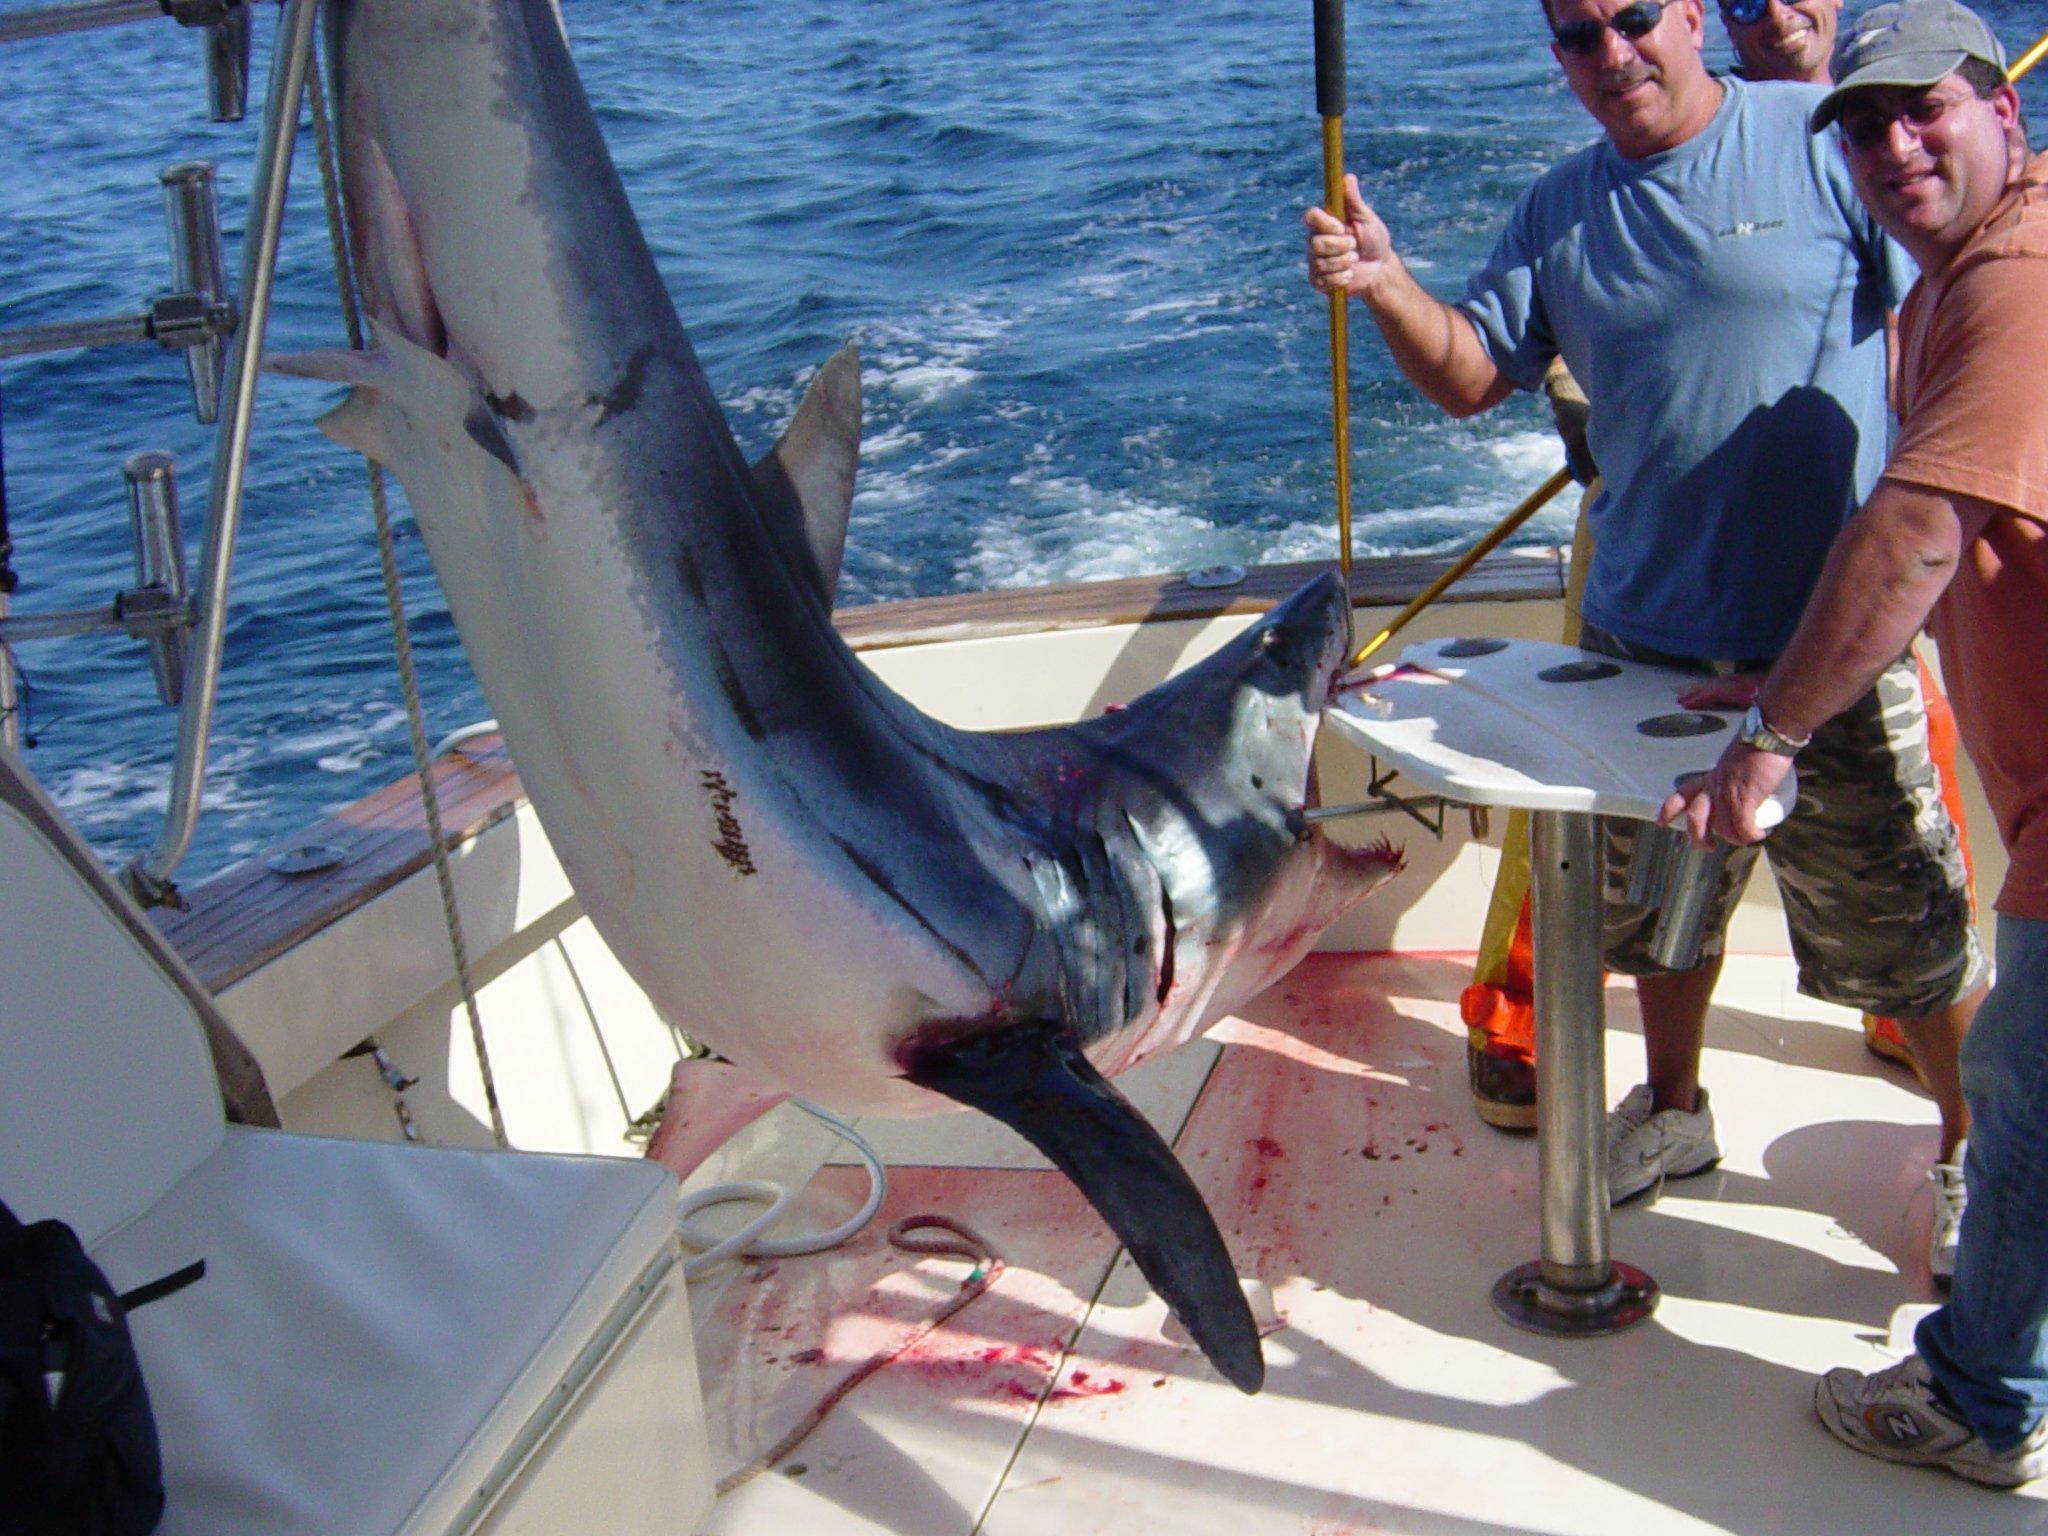 Captain Art's Fishing Charters image 11